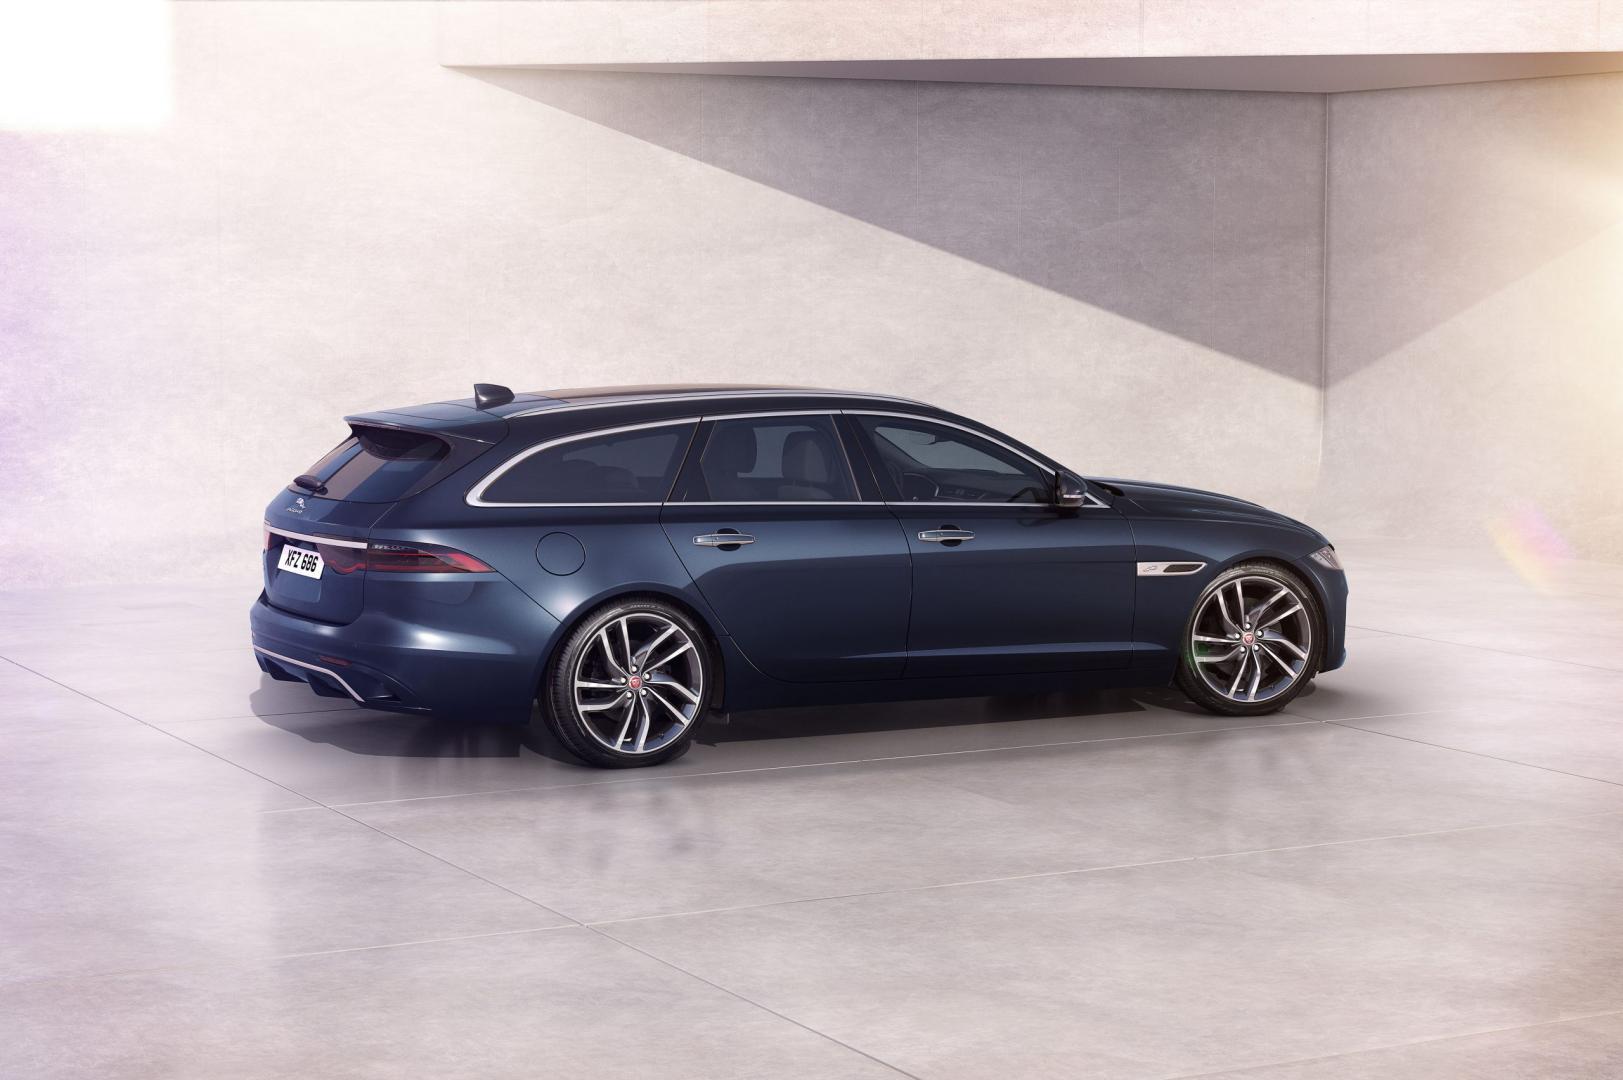 Jaguar XF Sportbrake facelift 2020